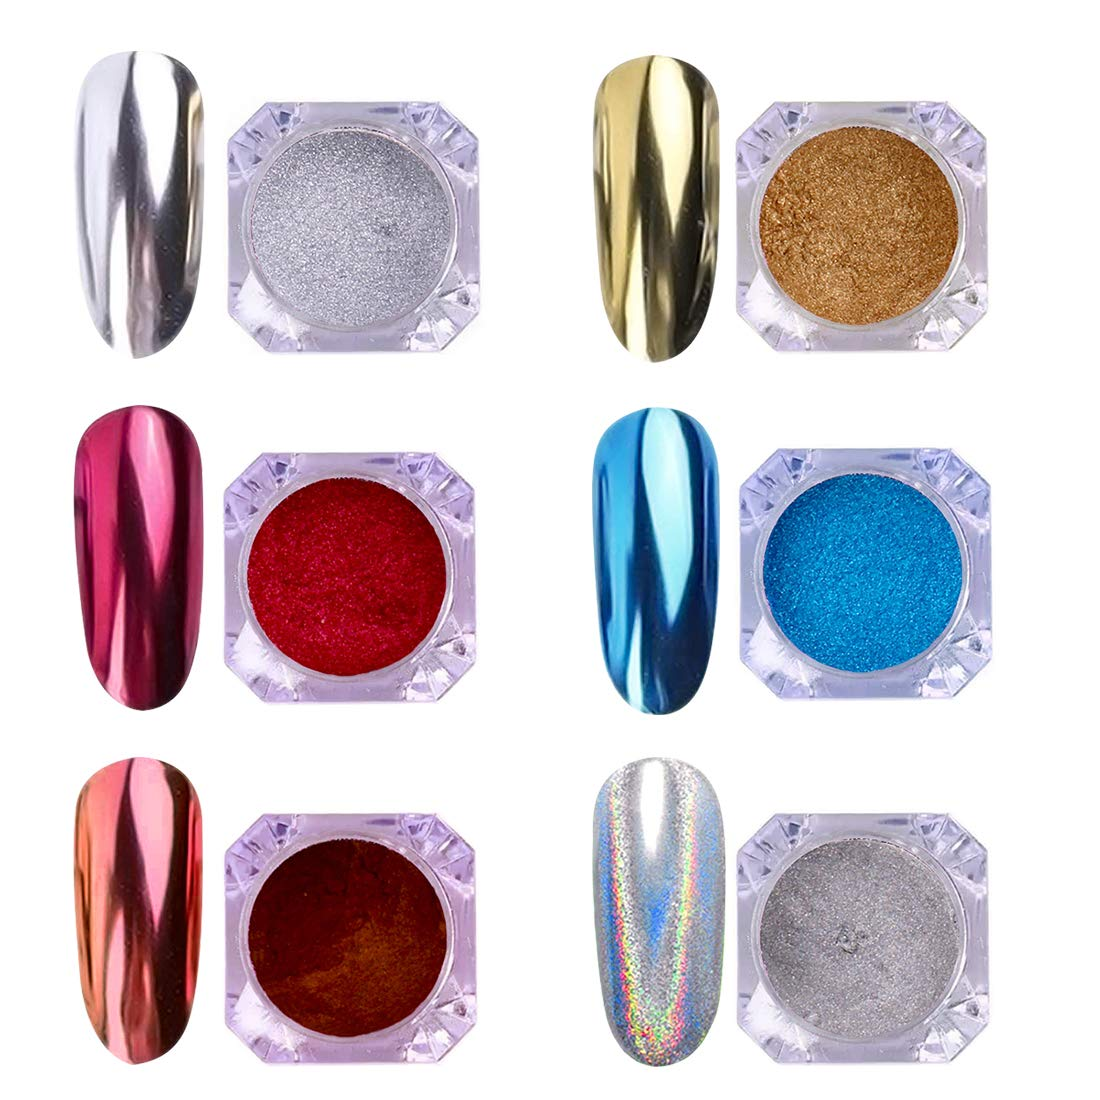 AIMEILI 6 Boxes Nail Art Manicure Powder Set, 1×0.5g Holographic Powder, 1×0.5g Chameleon Chrome Nail Powder, 4×0.5g Mirror Effect Nail Powder by AIMEILI